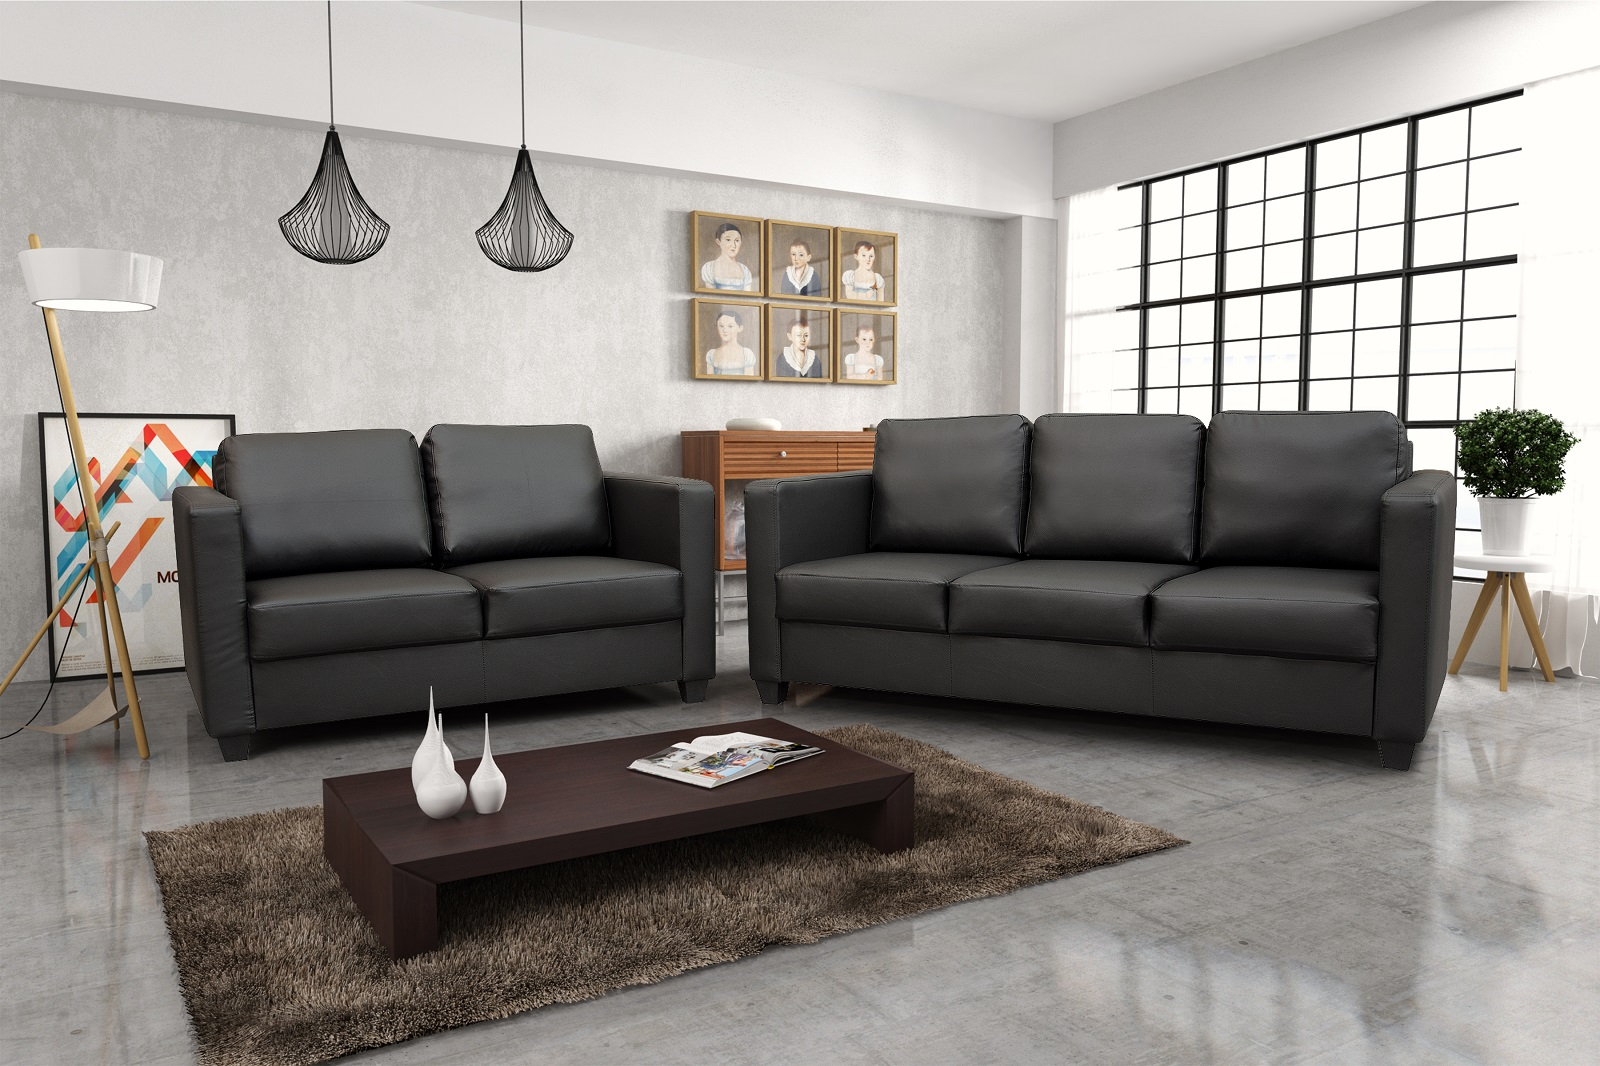 cube 3 2 sofa set pf furniture. Black Bedroom Furniture Sets. Home Design Ideas